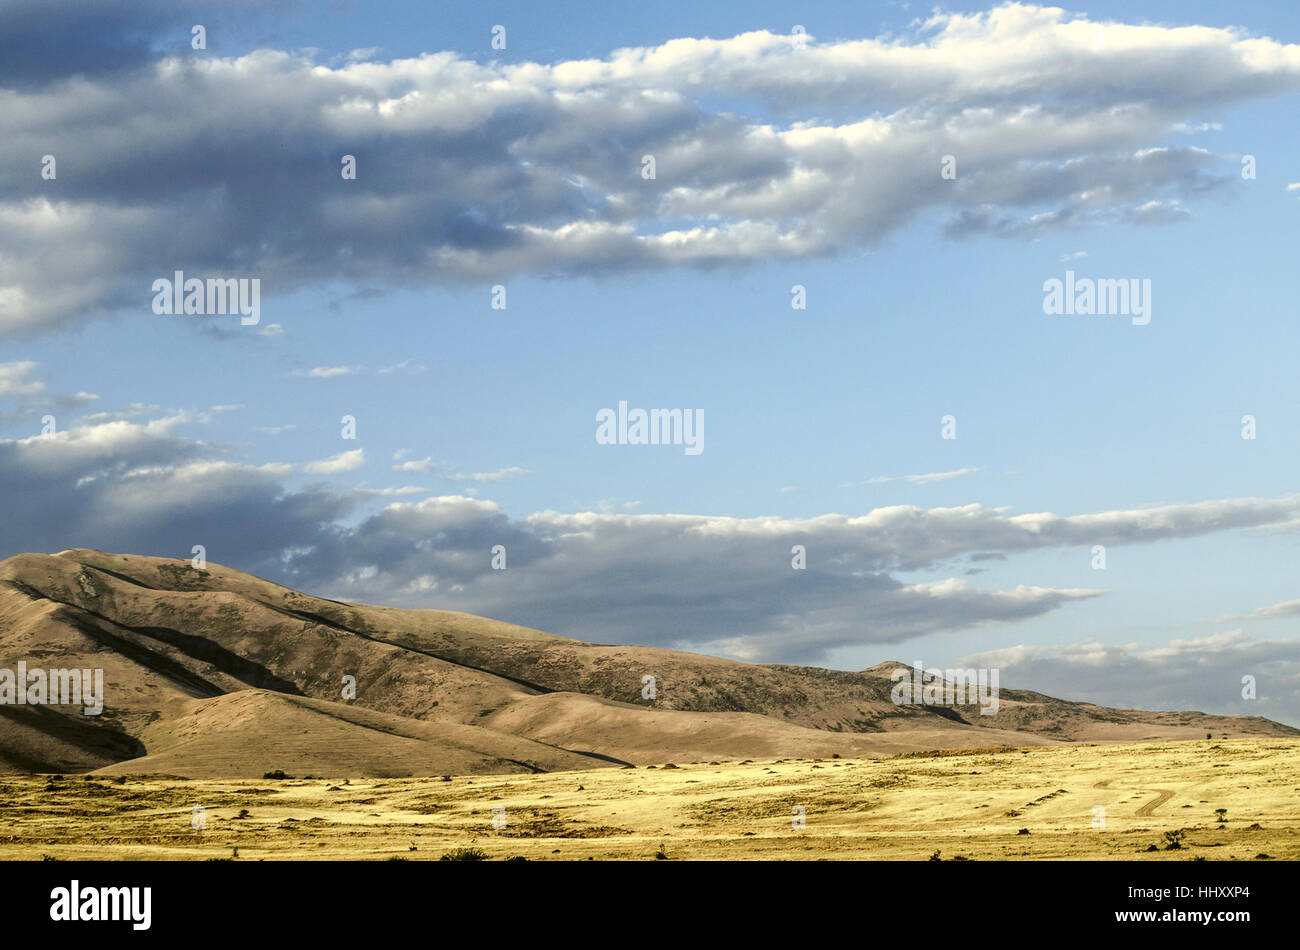 Verarbeitung finden professioneller Verkauf 60% günstig Nuvole di pioggia incombente alla montagna Ara ler in ...